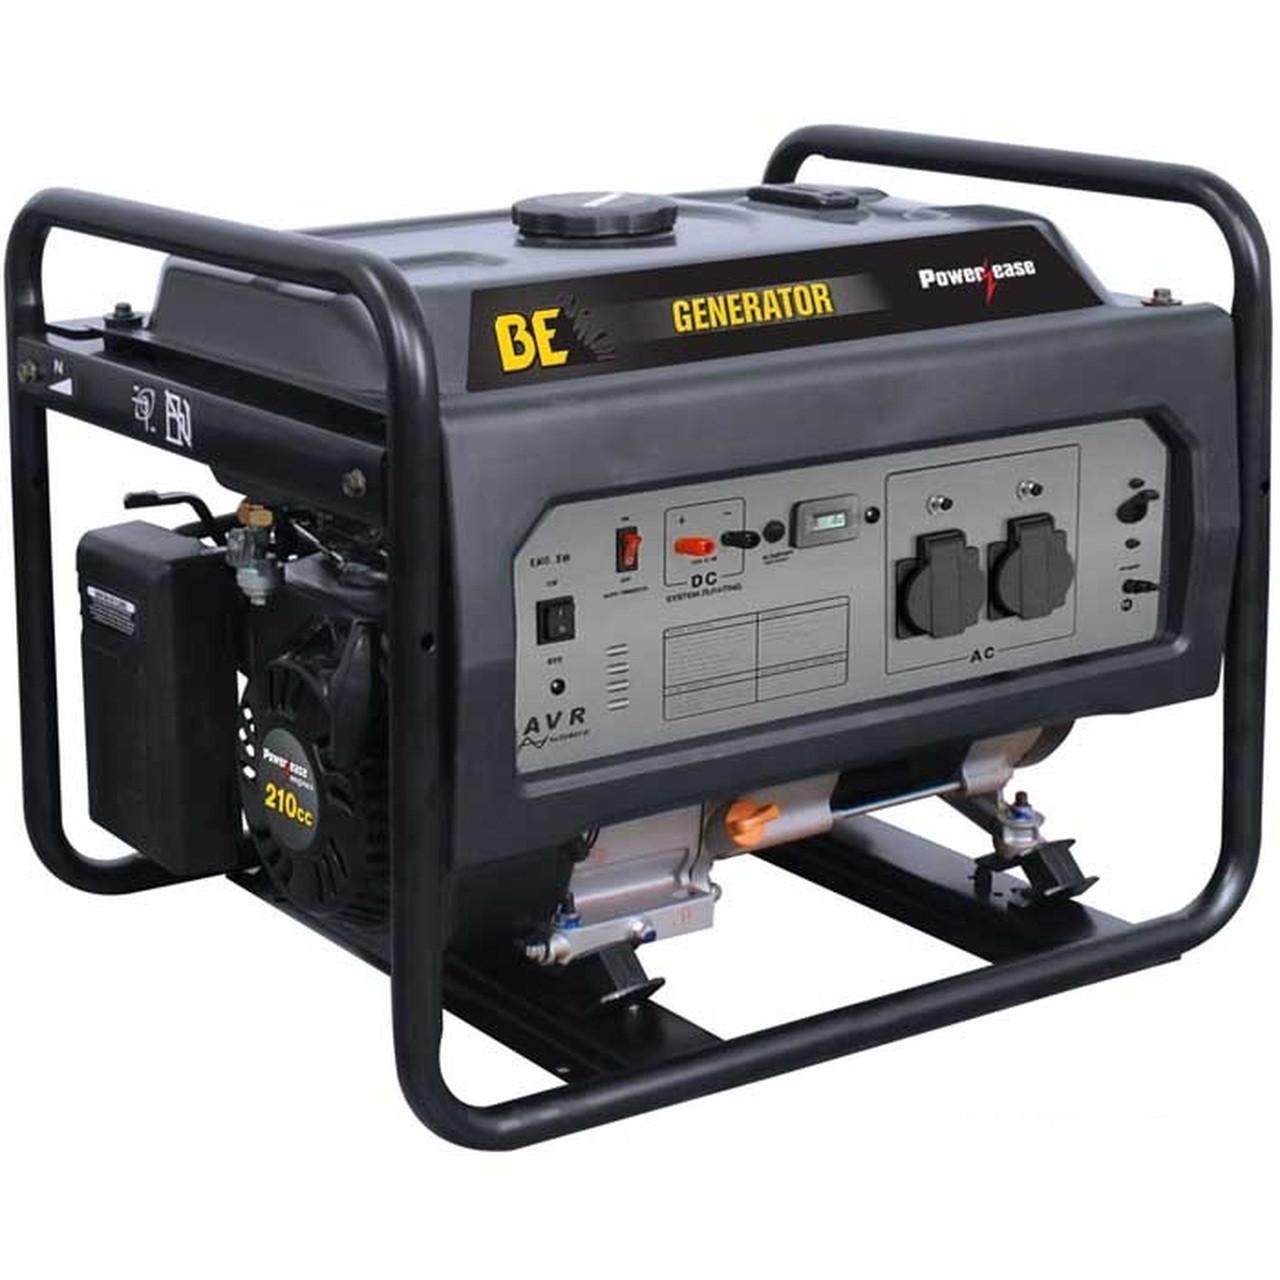 Powerease Generators